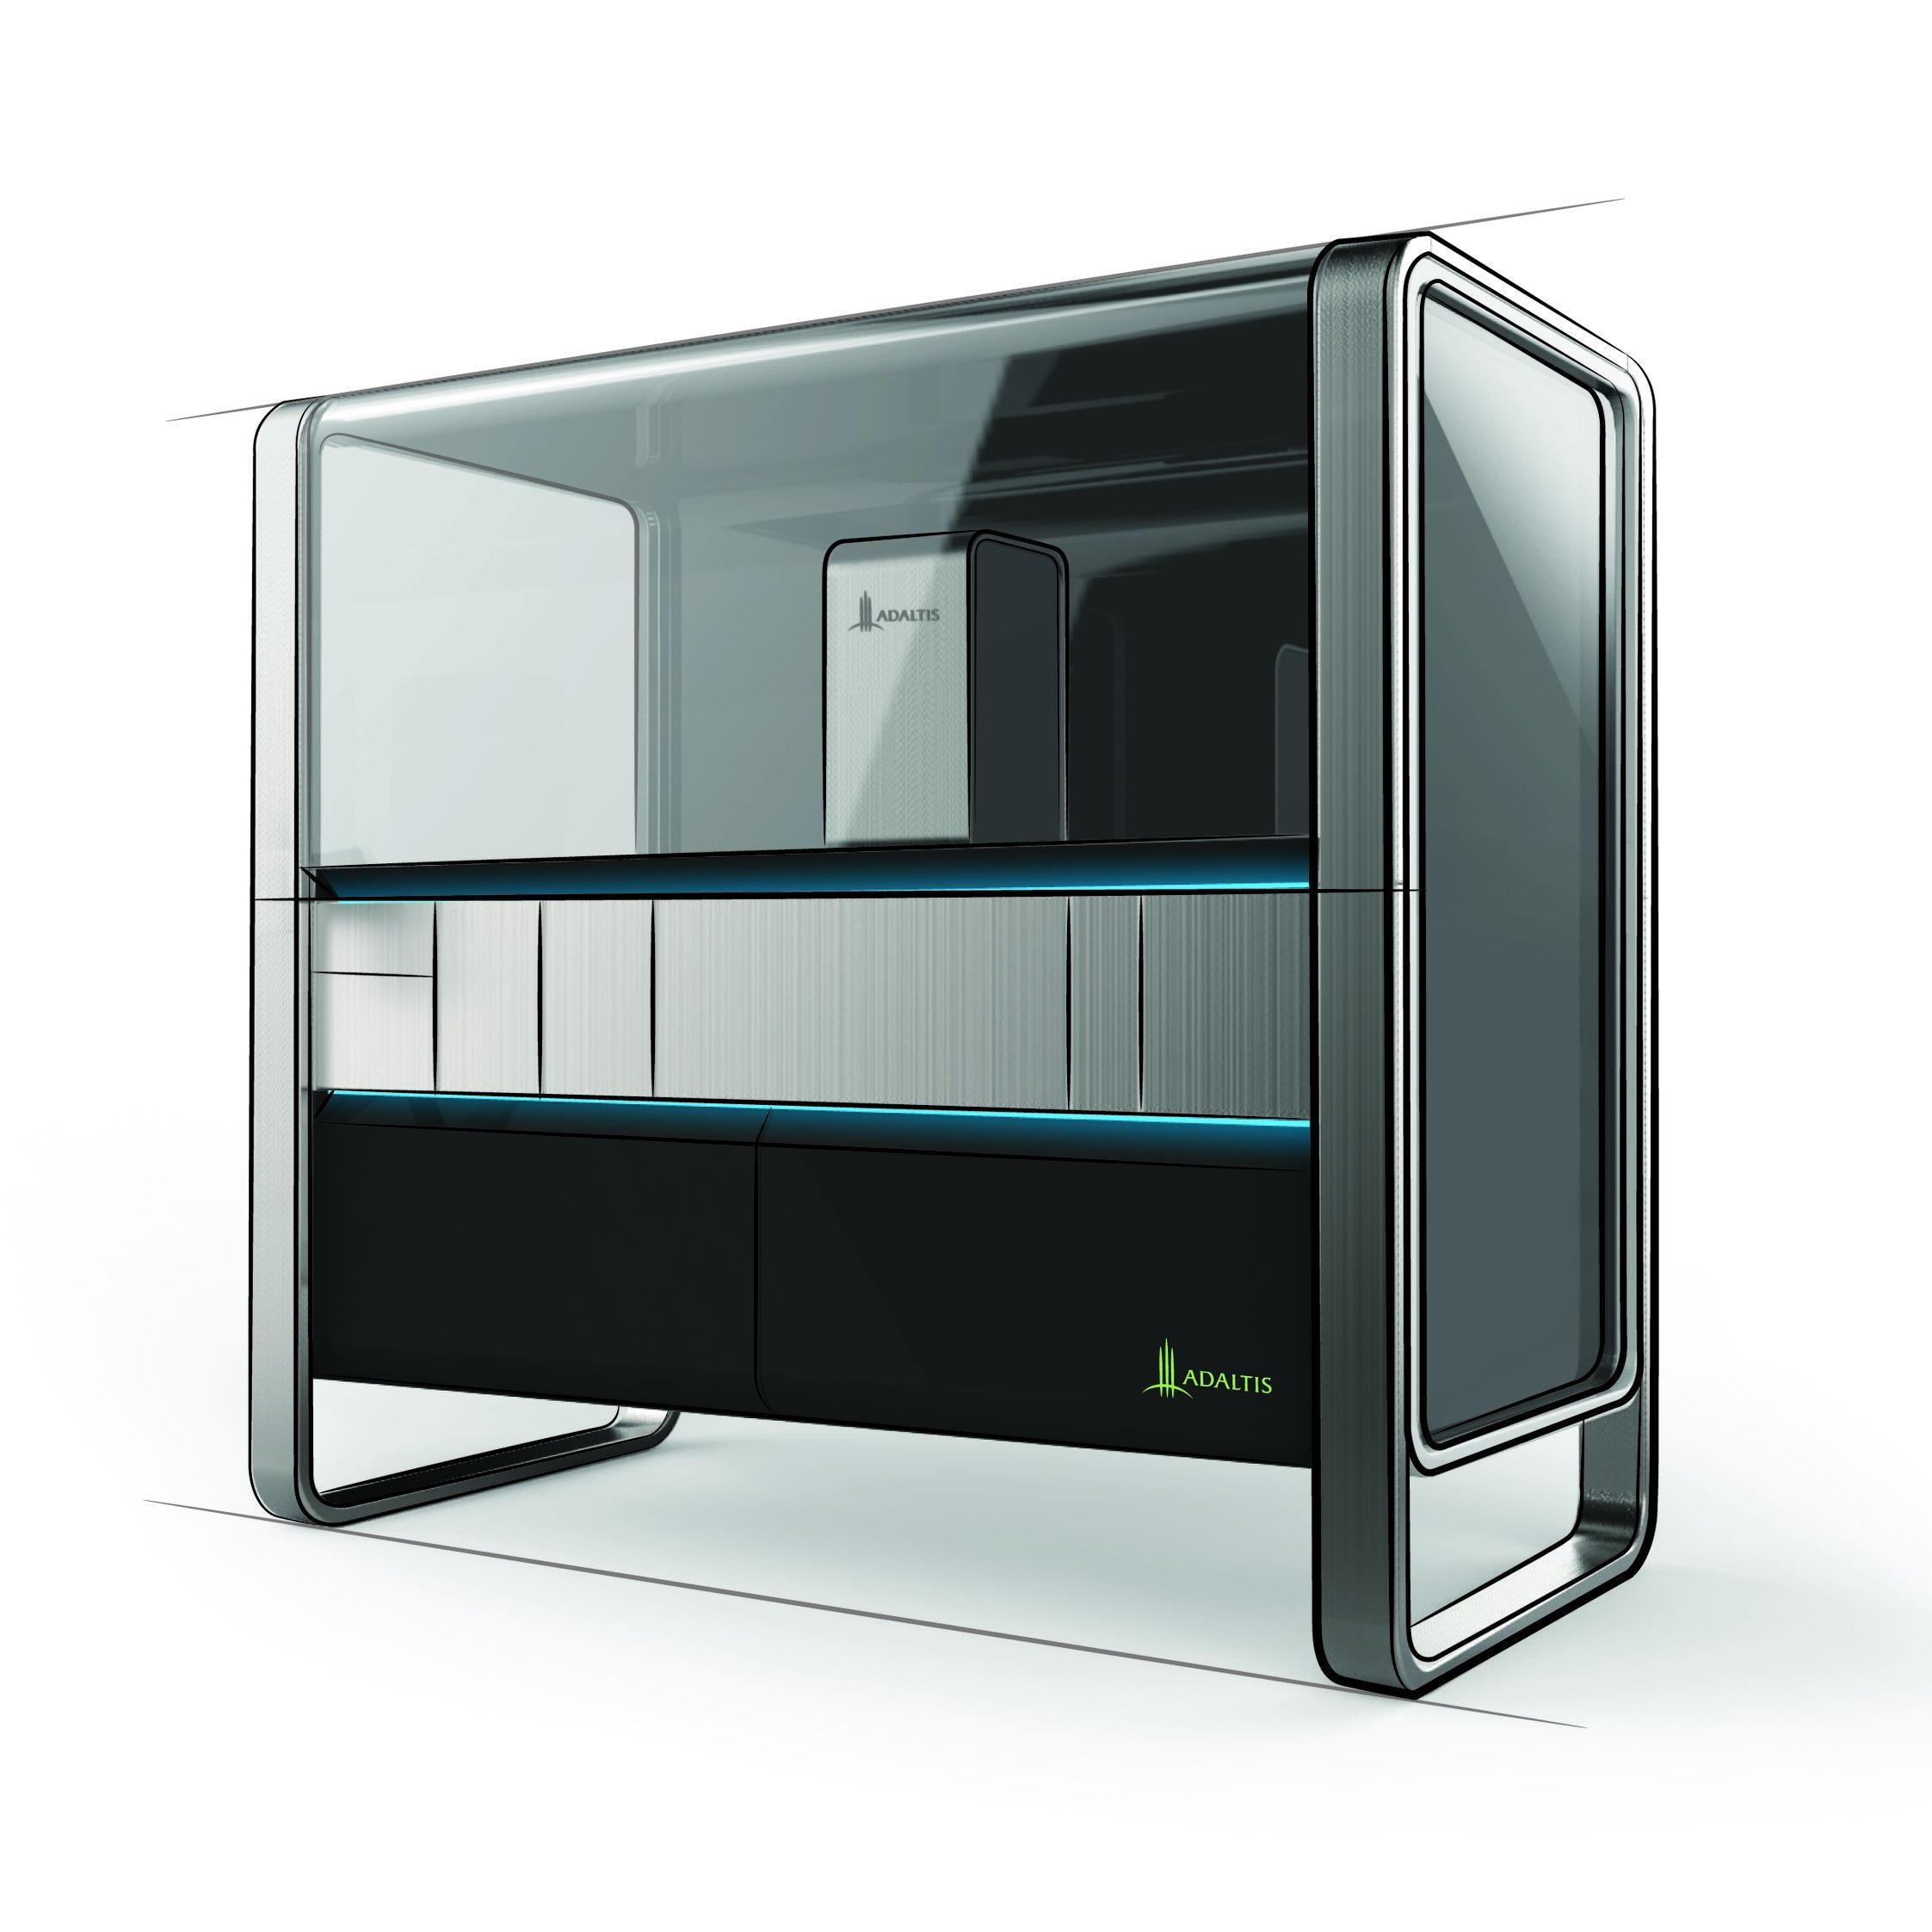 Design Icon Ltd. Design Studio Consultancy Hong Kong Product Graphic Design